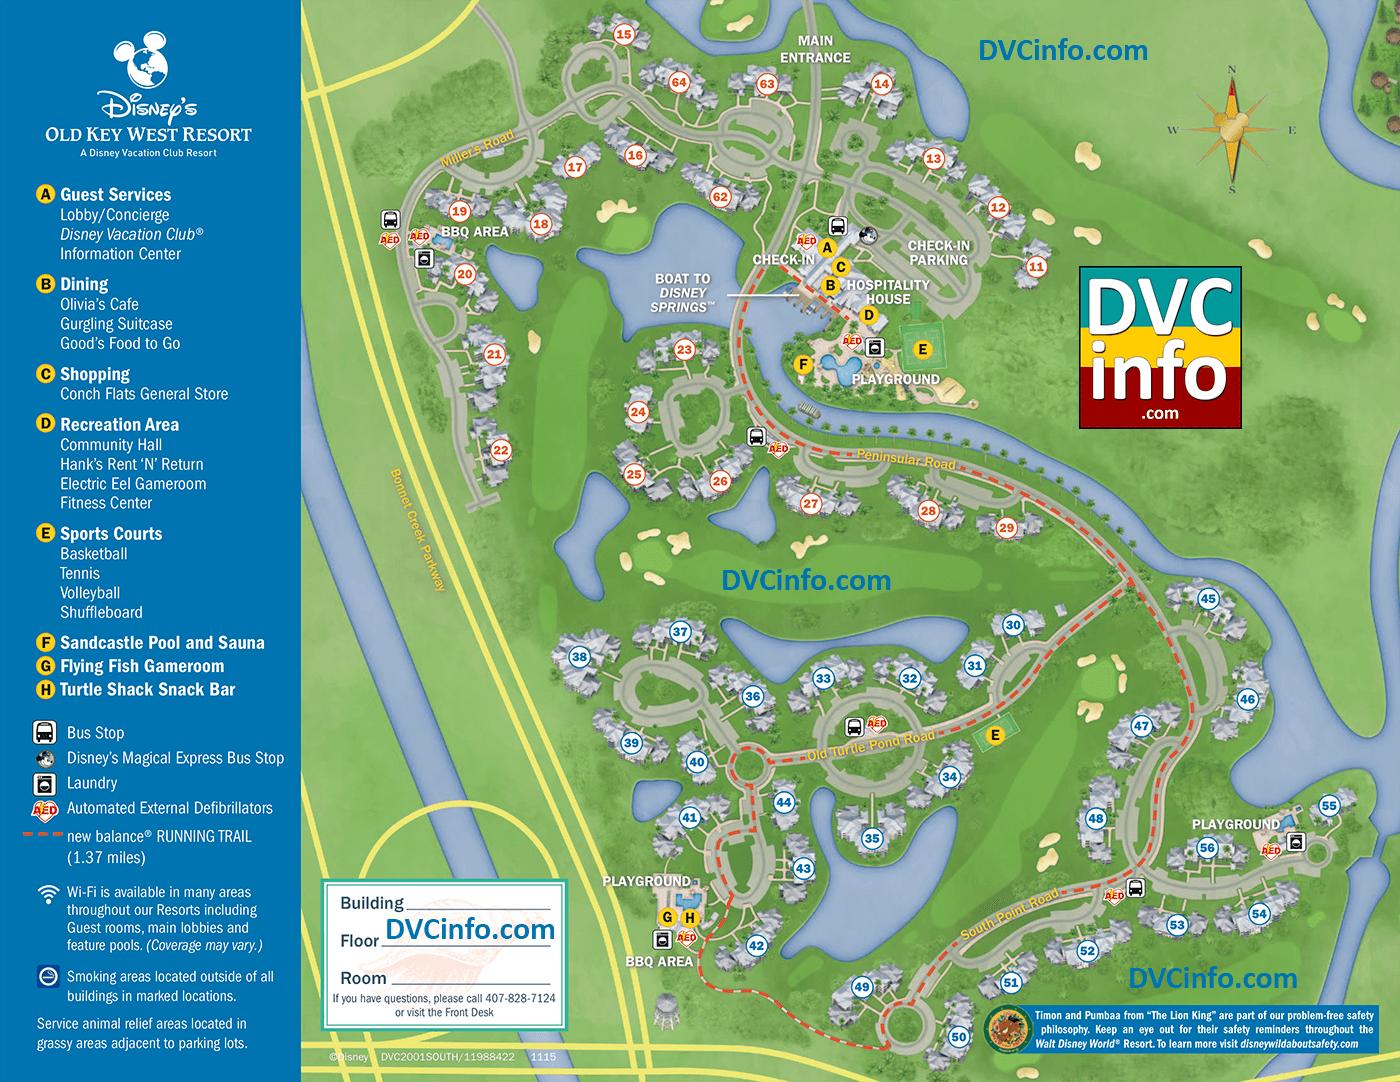 Disney's Old Key West Resort - DVCinfo on